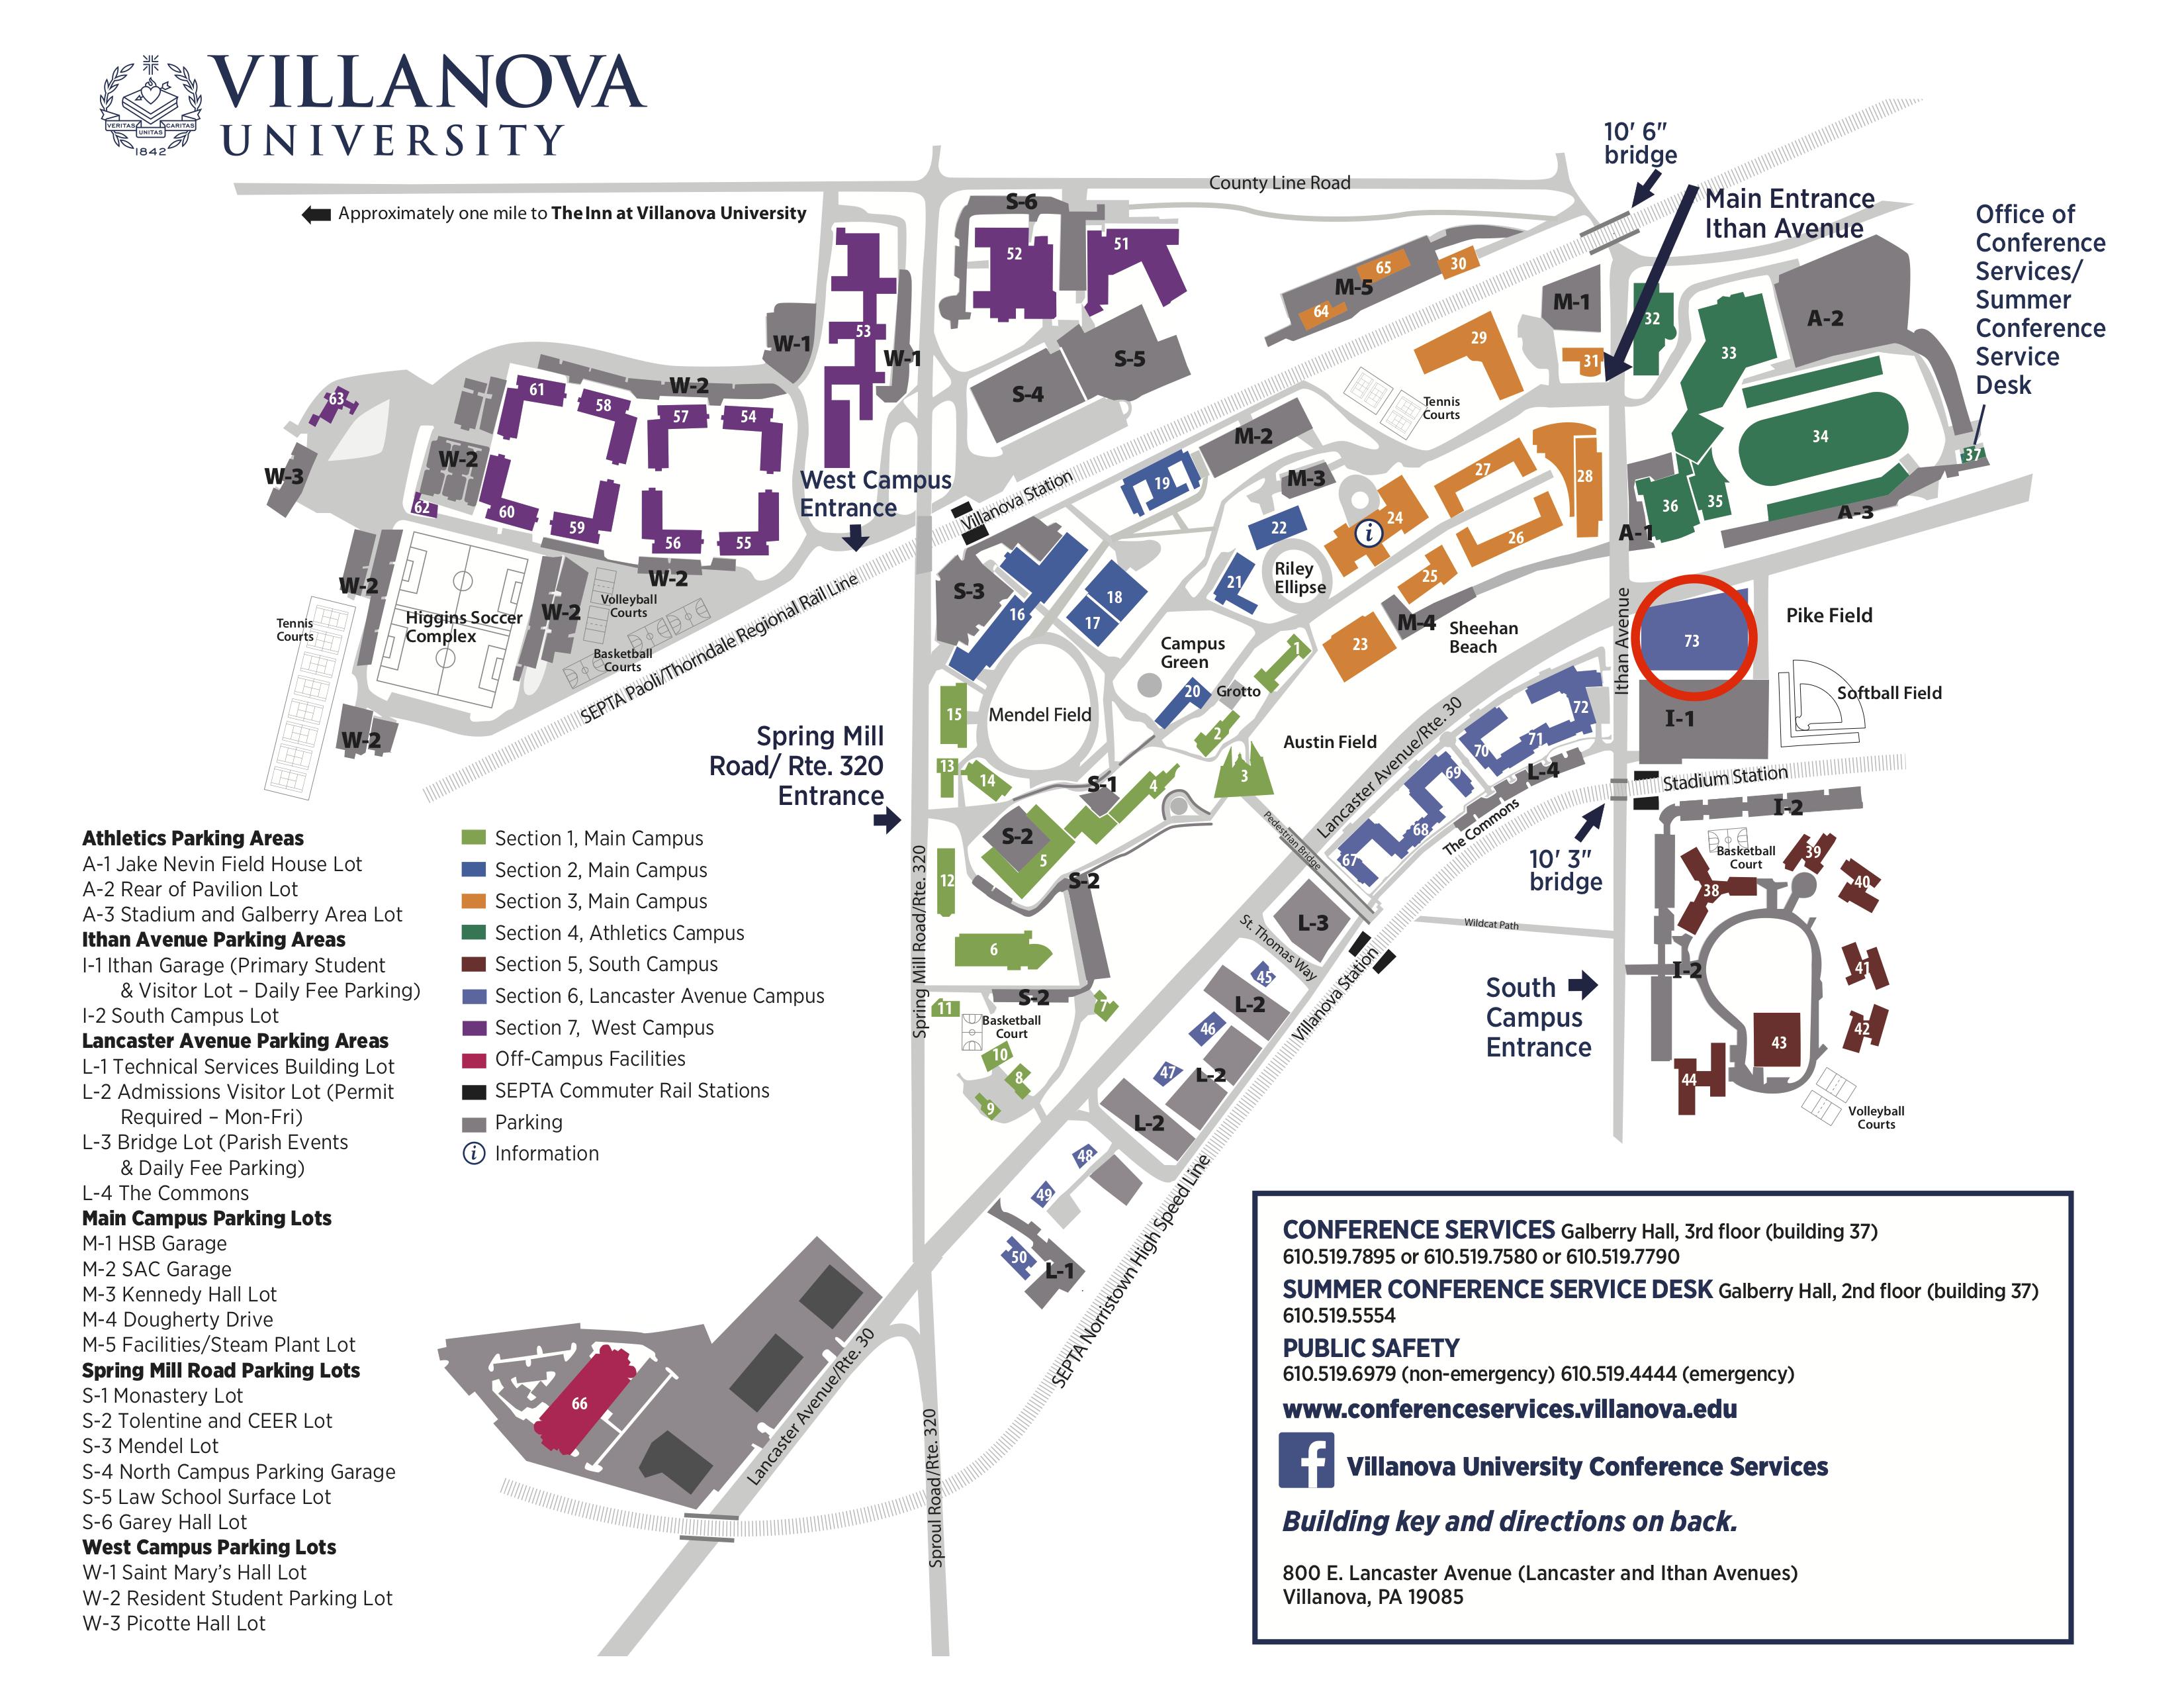 Villanova Campus Map - Performing Arts Center